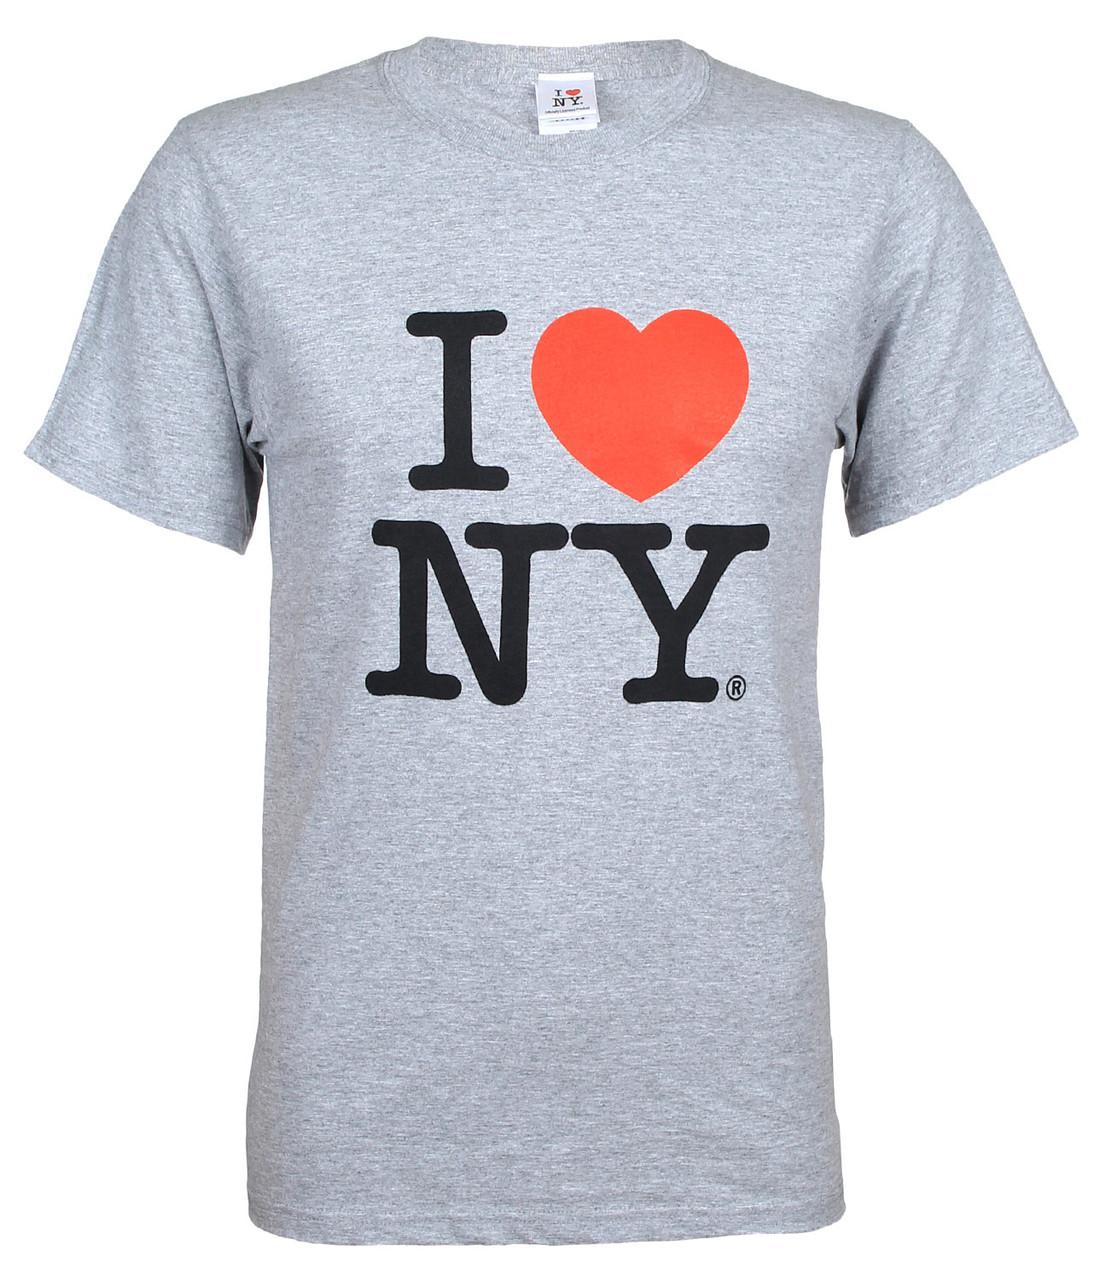 I Love NY T-Shirt White Official New York City Tee Hear NYC Shirt Licensed Tags